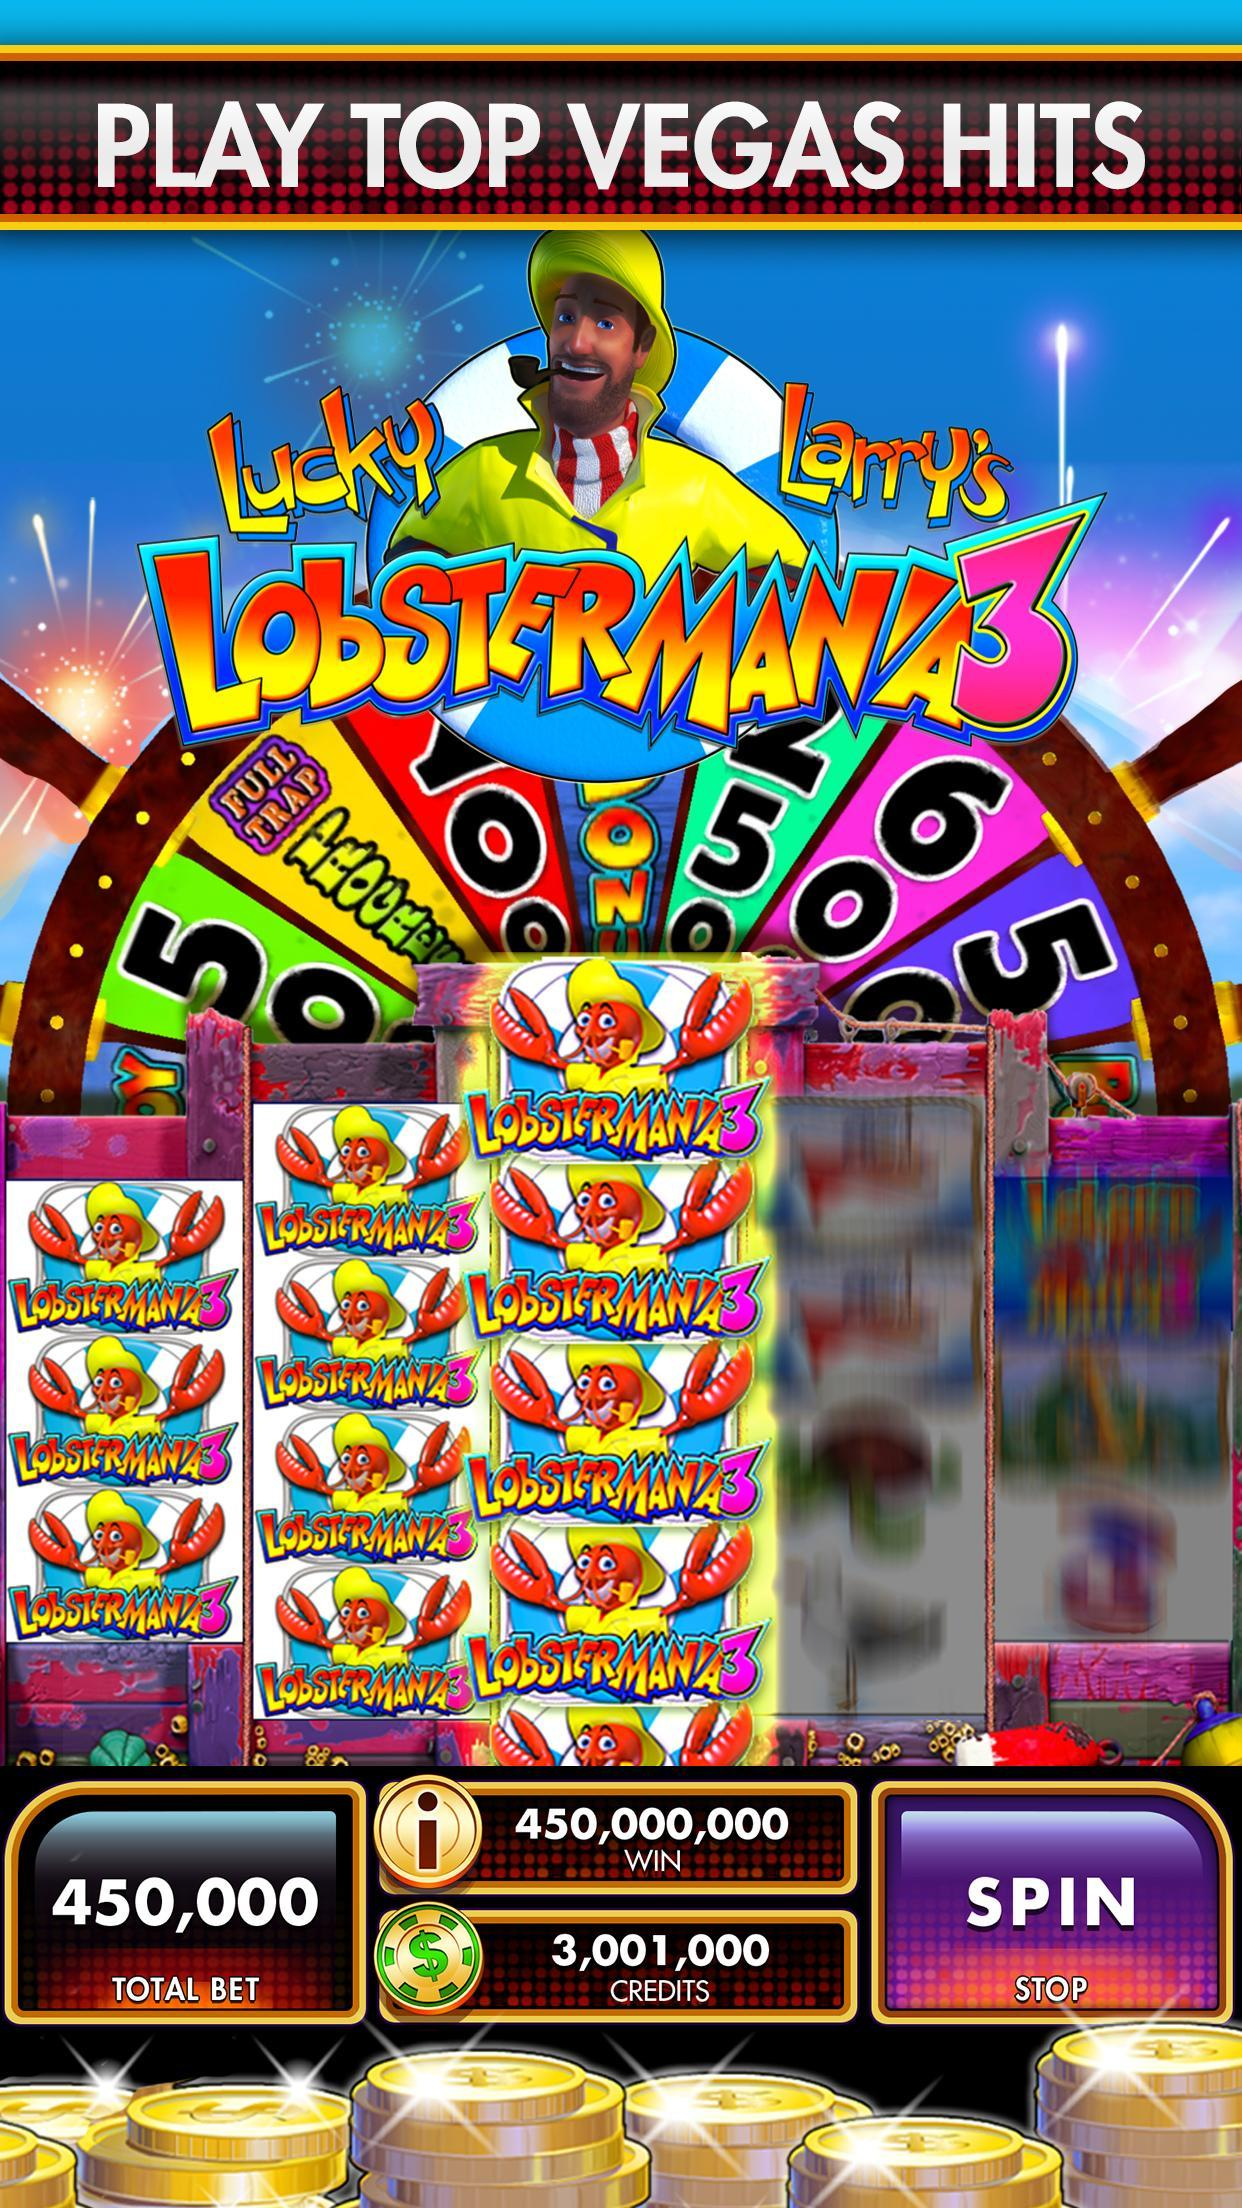 Casino Slots DoubleDown Fort Knox Free Vegas Games 1.26.7 Screenshot 1